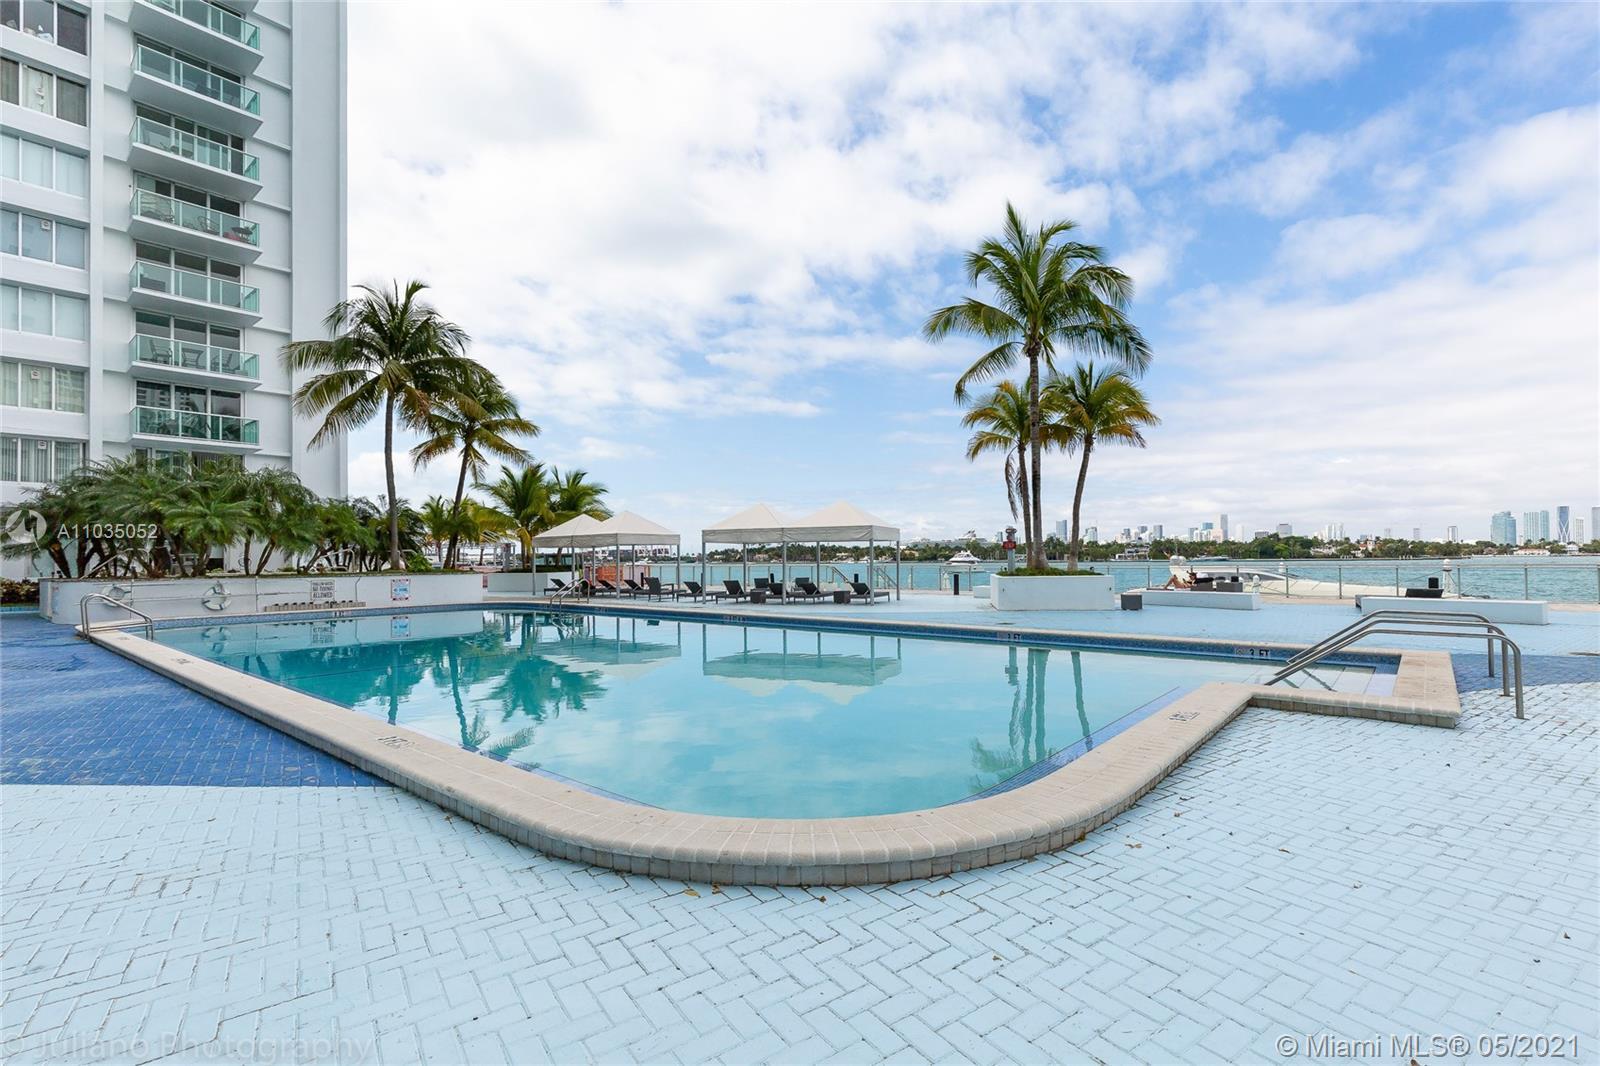 Mirador South #732 - 1000 West Ave #732, Miami Beach, FL 33139